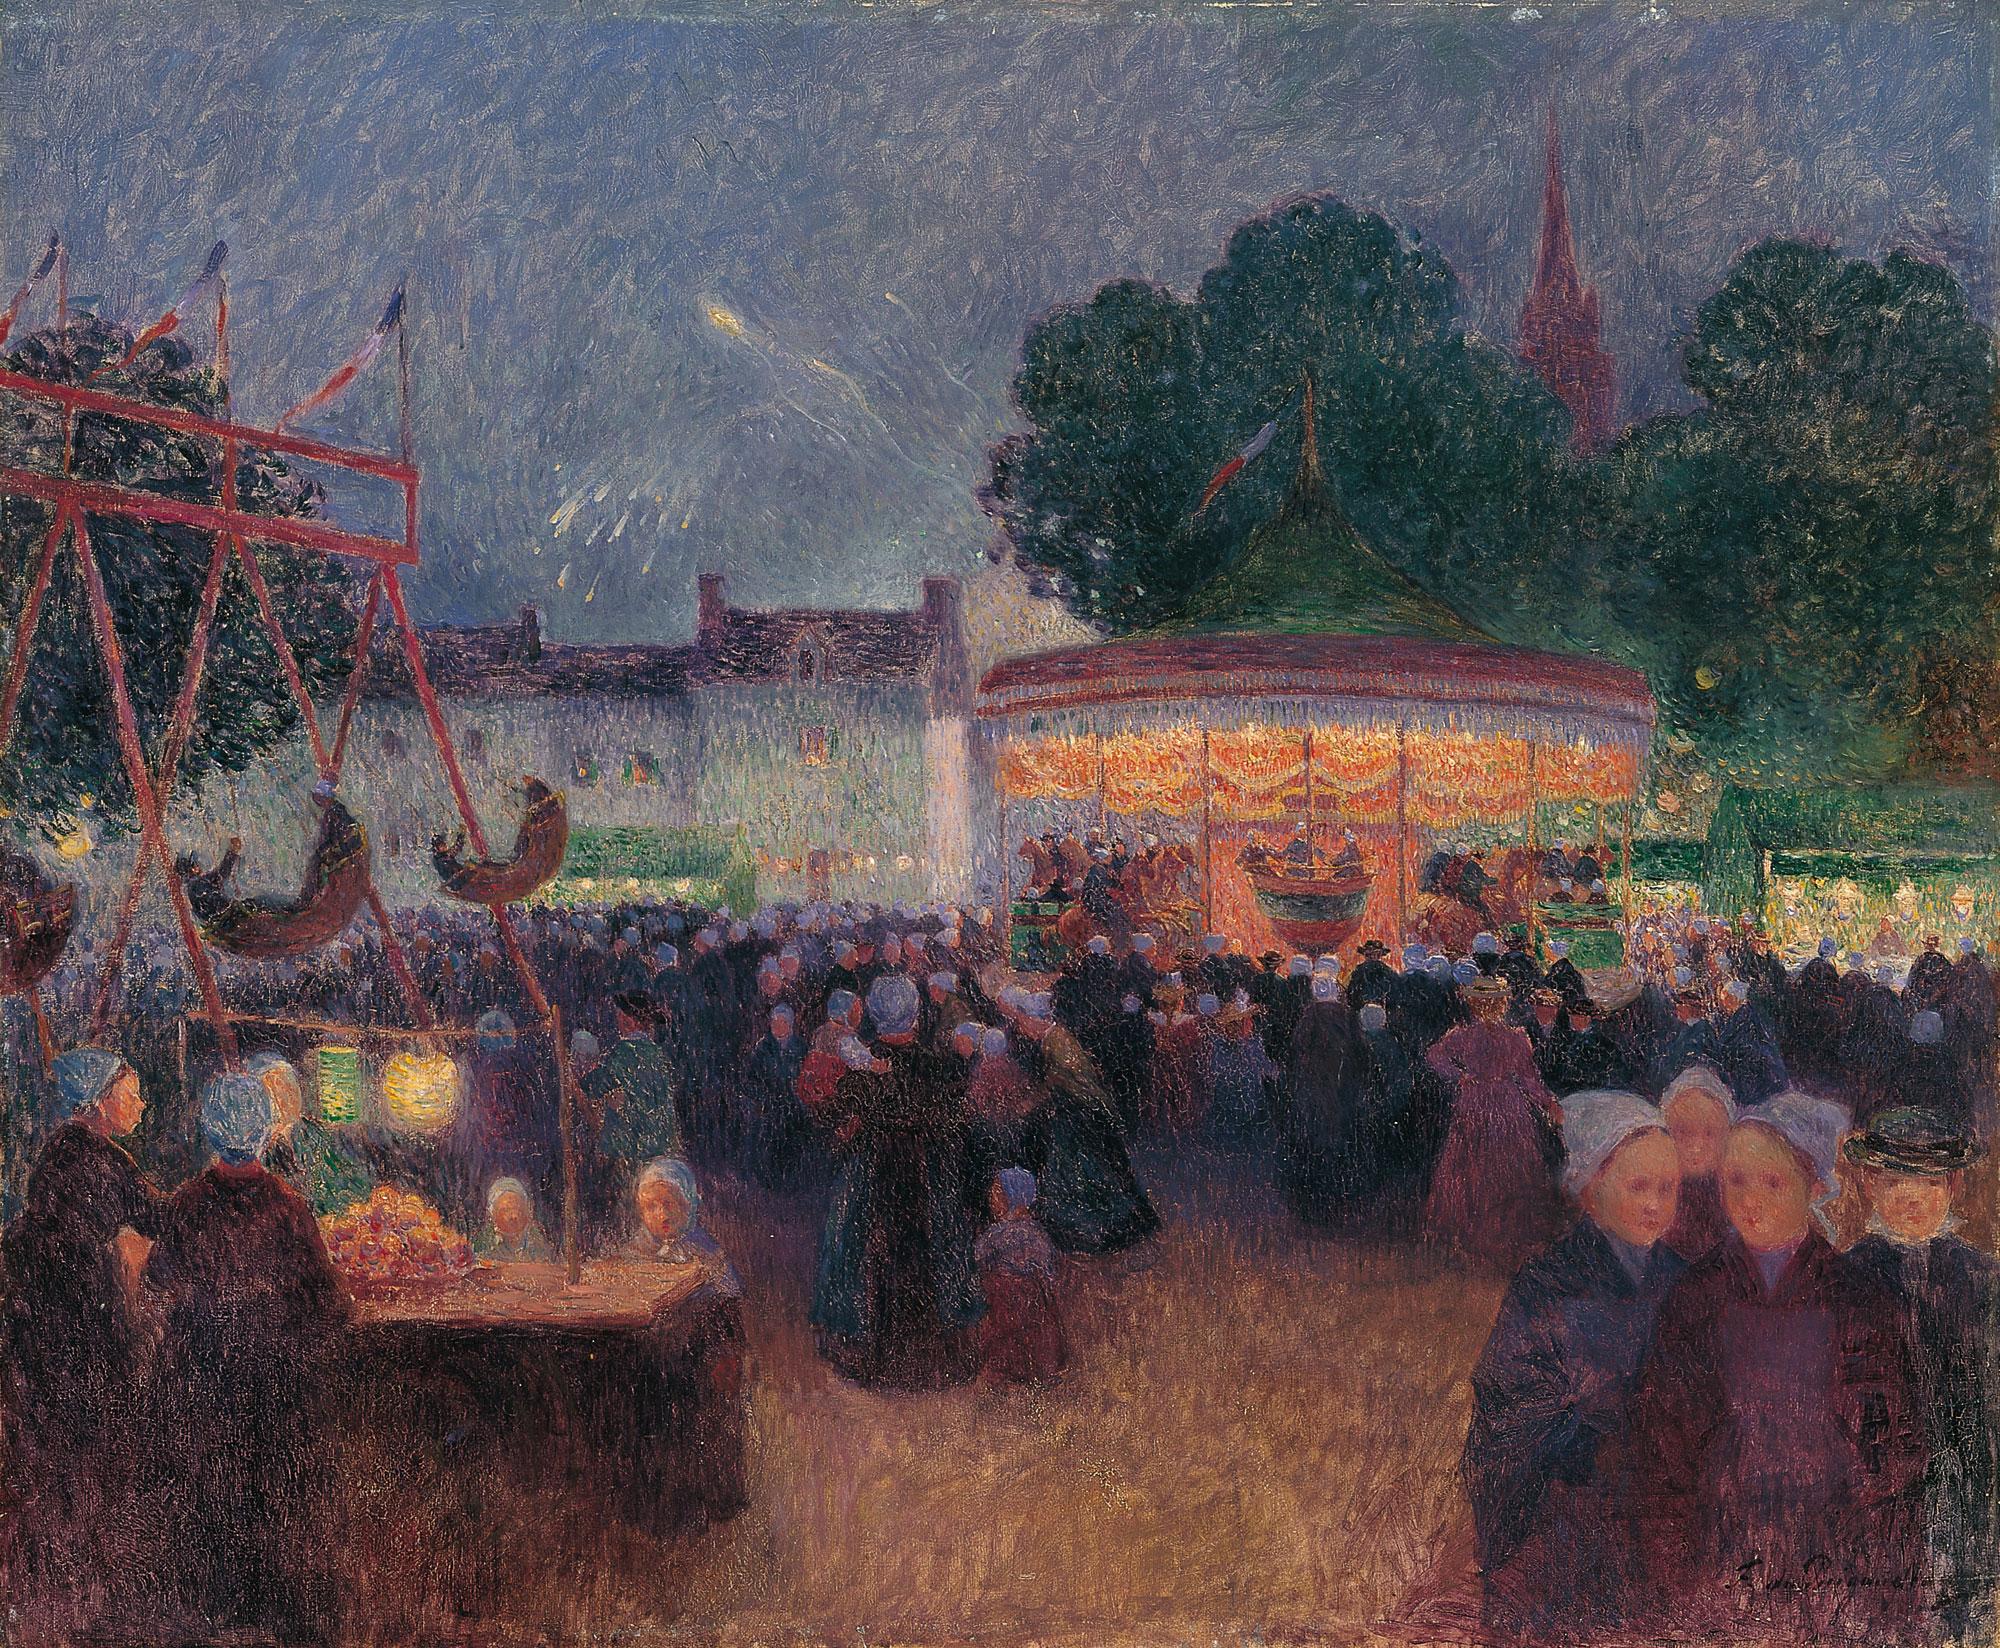 Fiesta nocturna en Saint-Pol-de-Léon